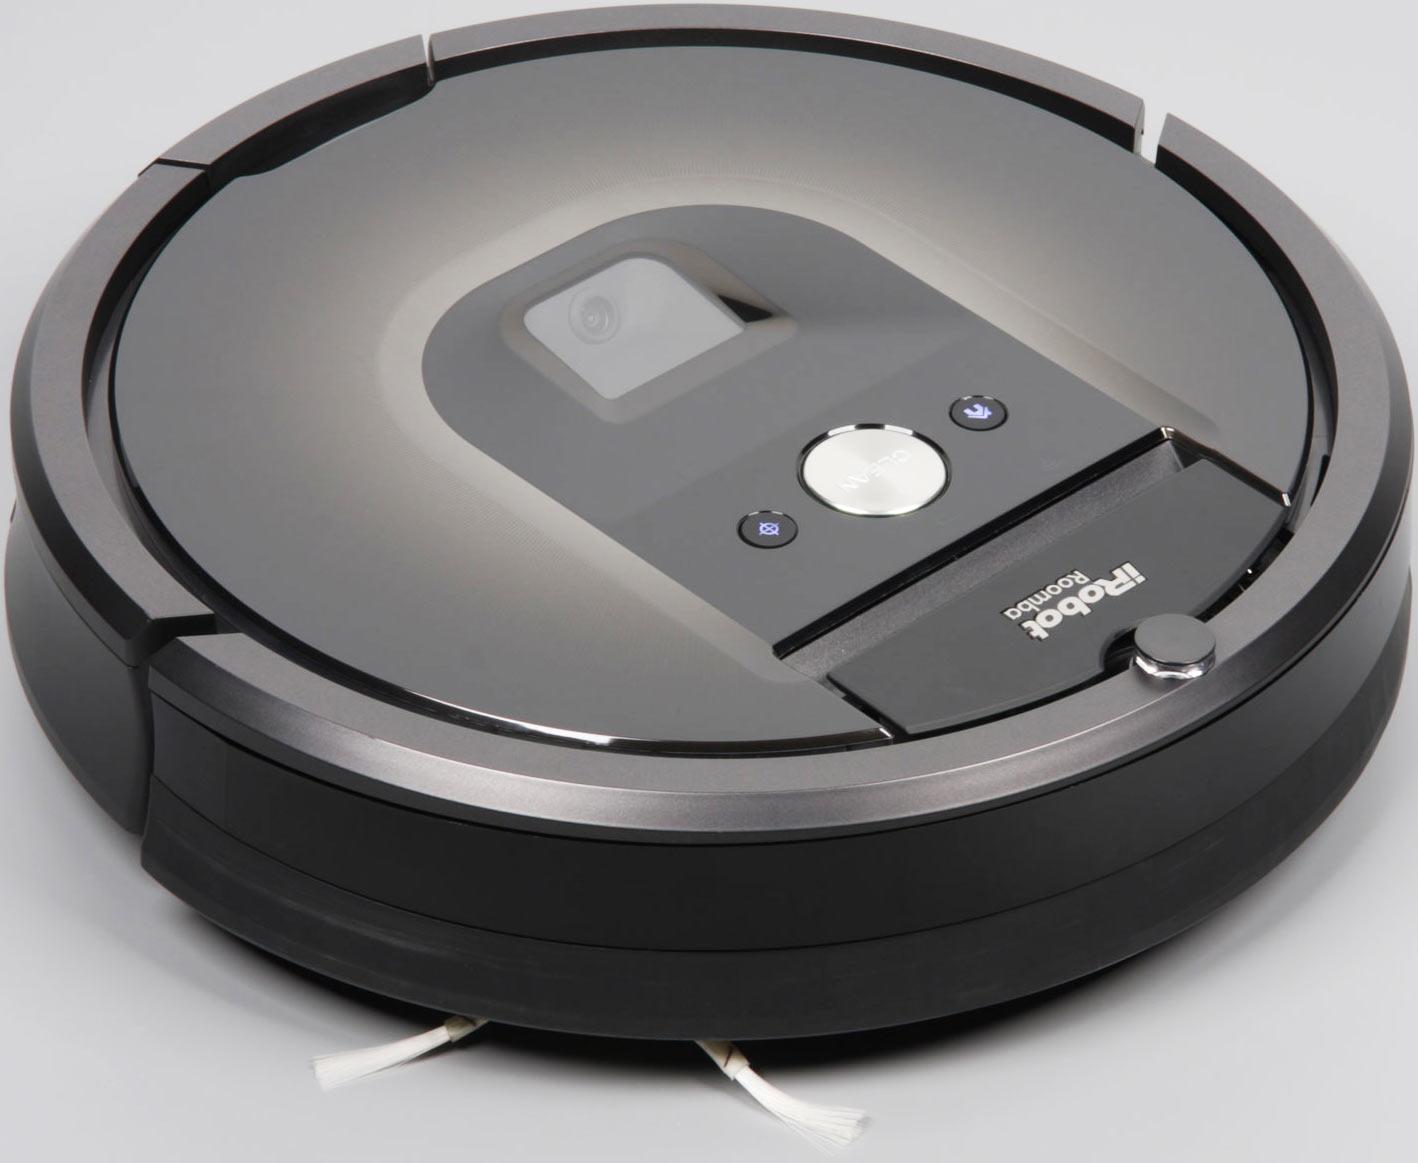 iRobot Roomba 980 front